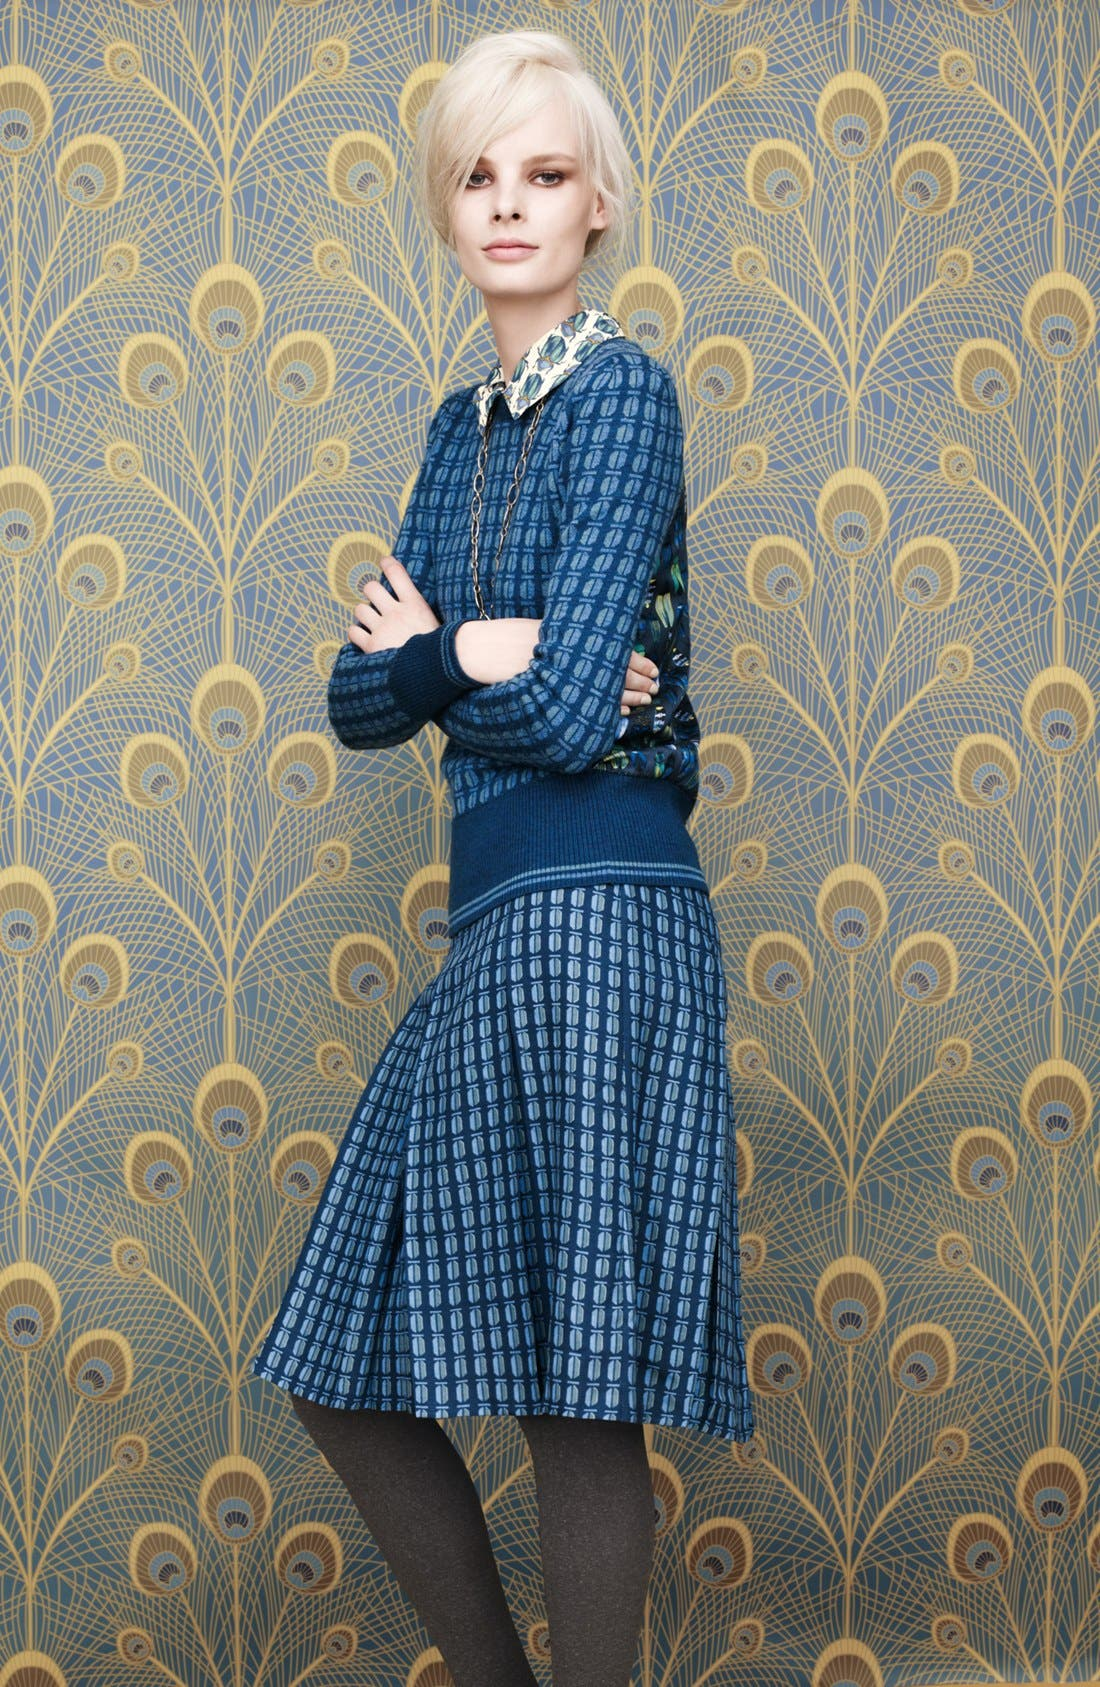 Alternate Image 1 Selected - Tory Burch Sweater, Blouse, Skirt & Pump